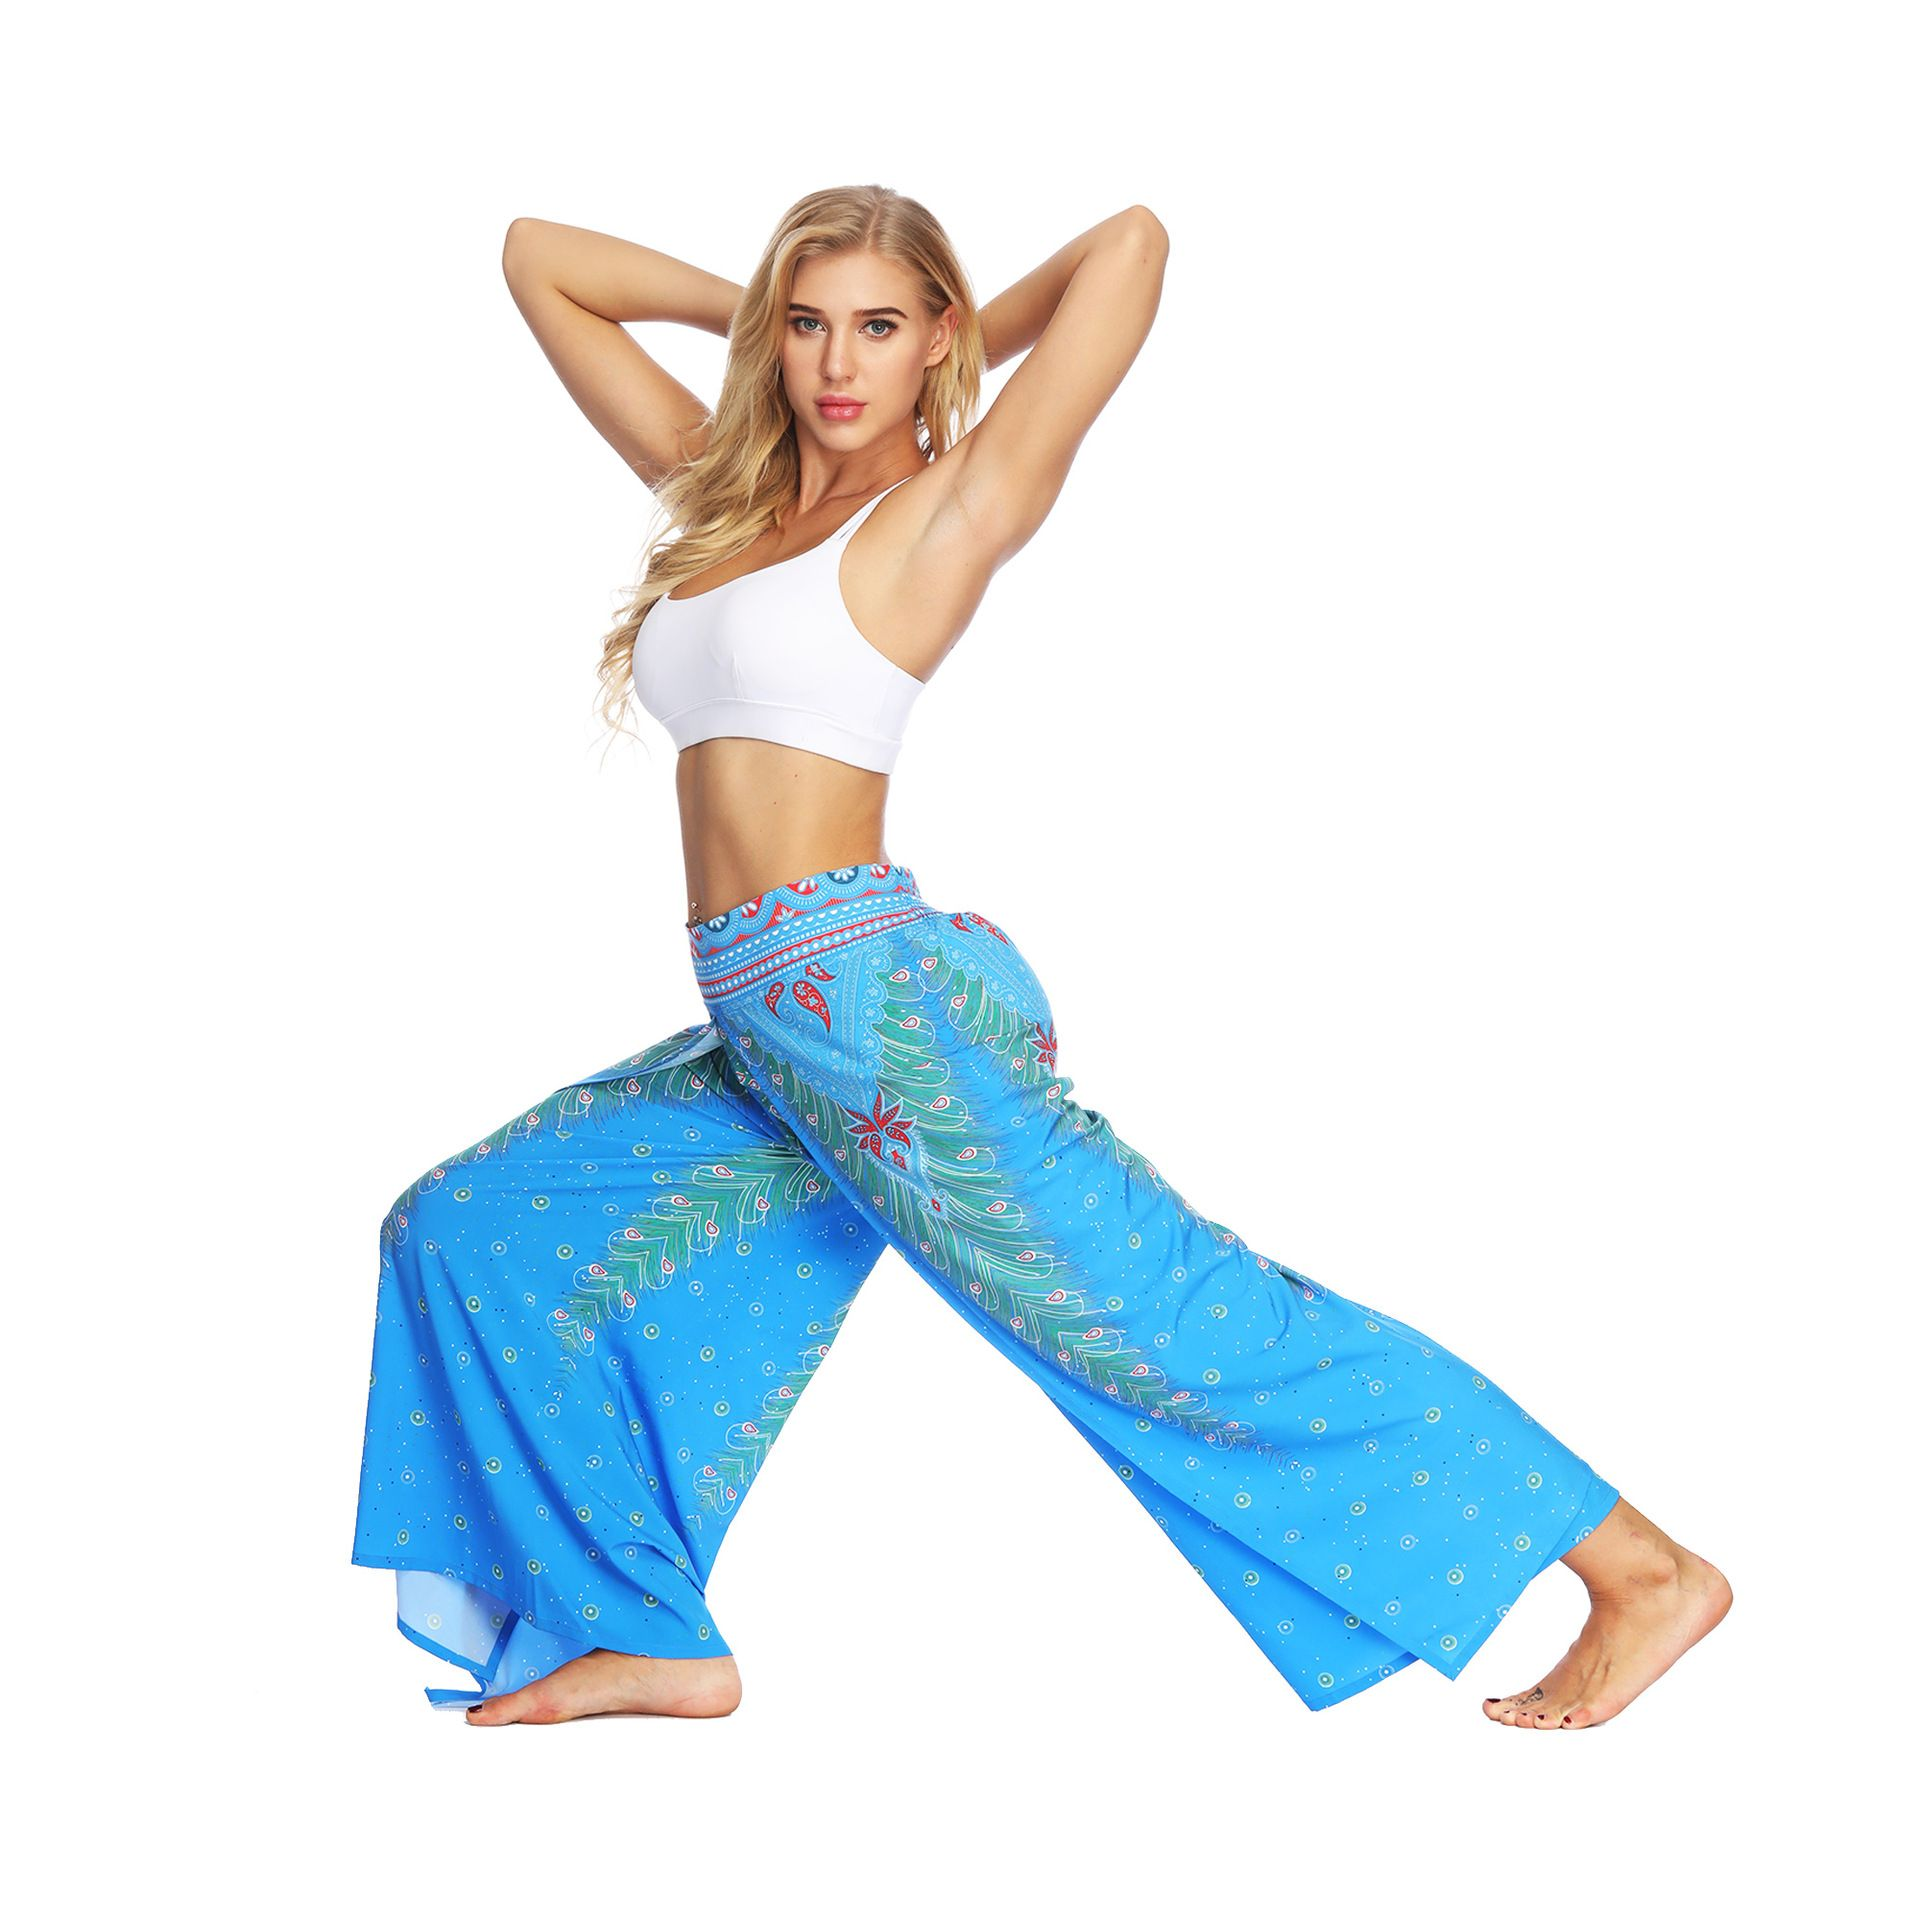 Palazzo pants| hippie trousers Thai trousers unisex baggy trousers Split leg elephant trousers boho trousers